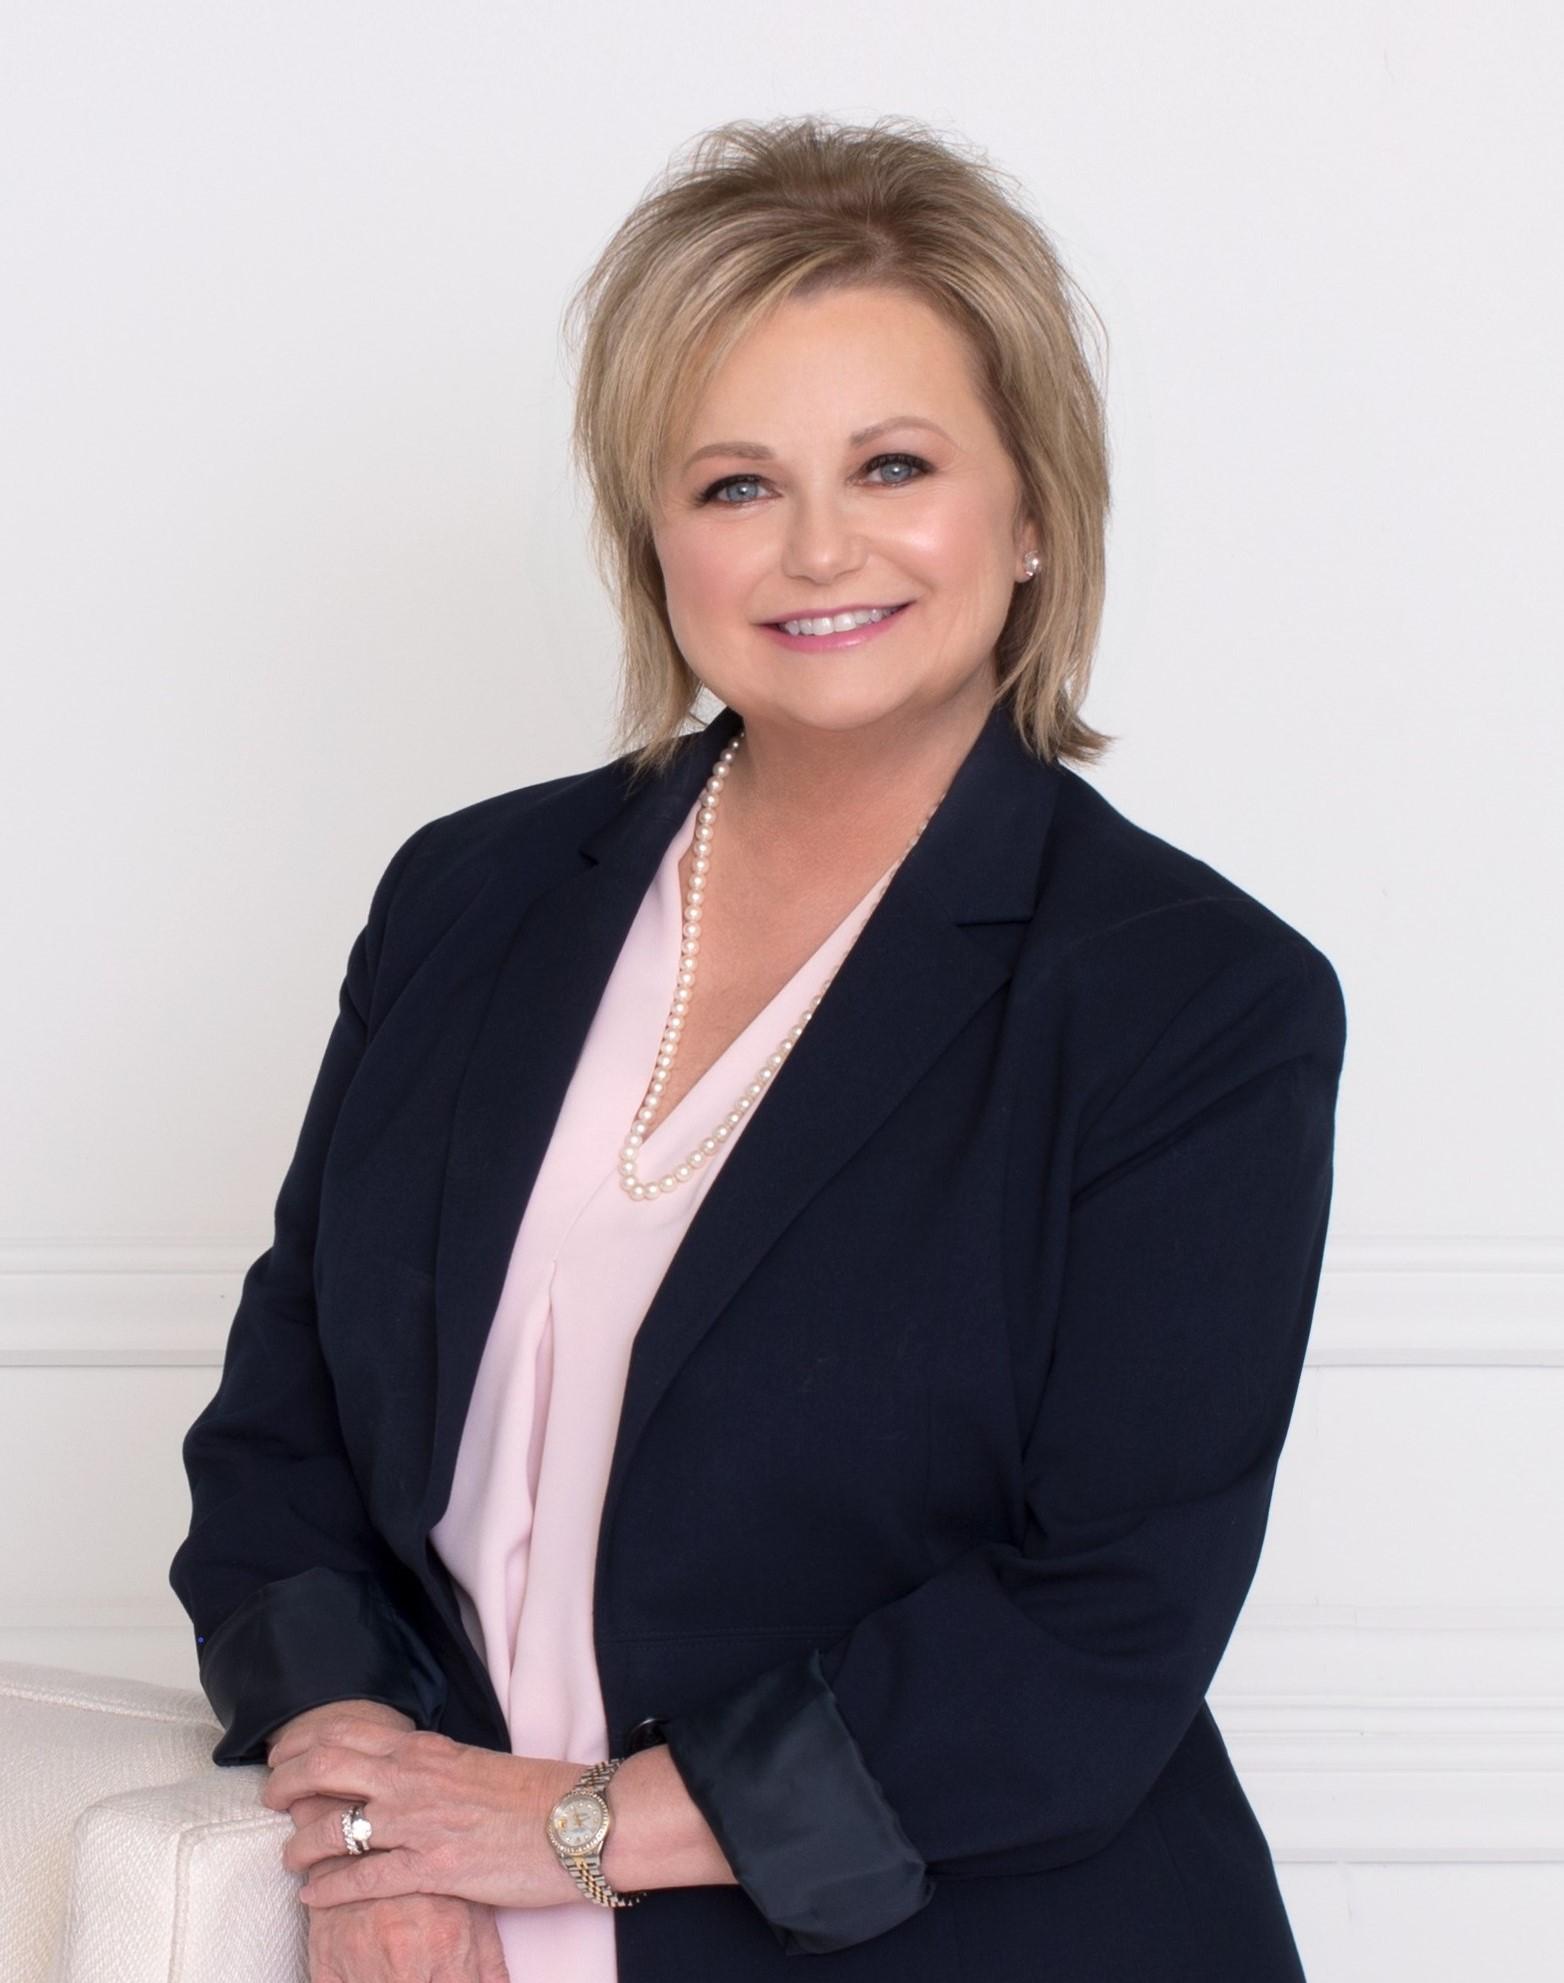 Paula S. Thompson